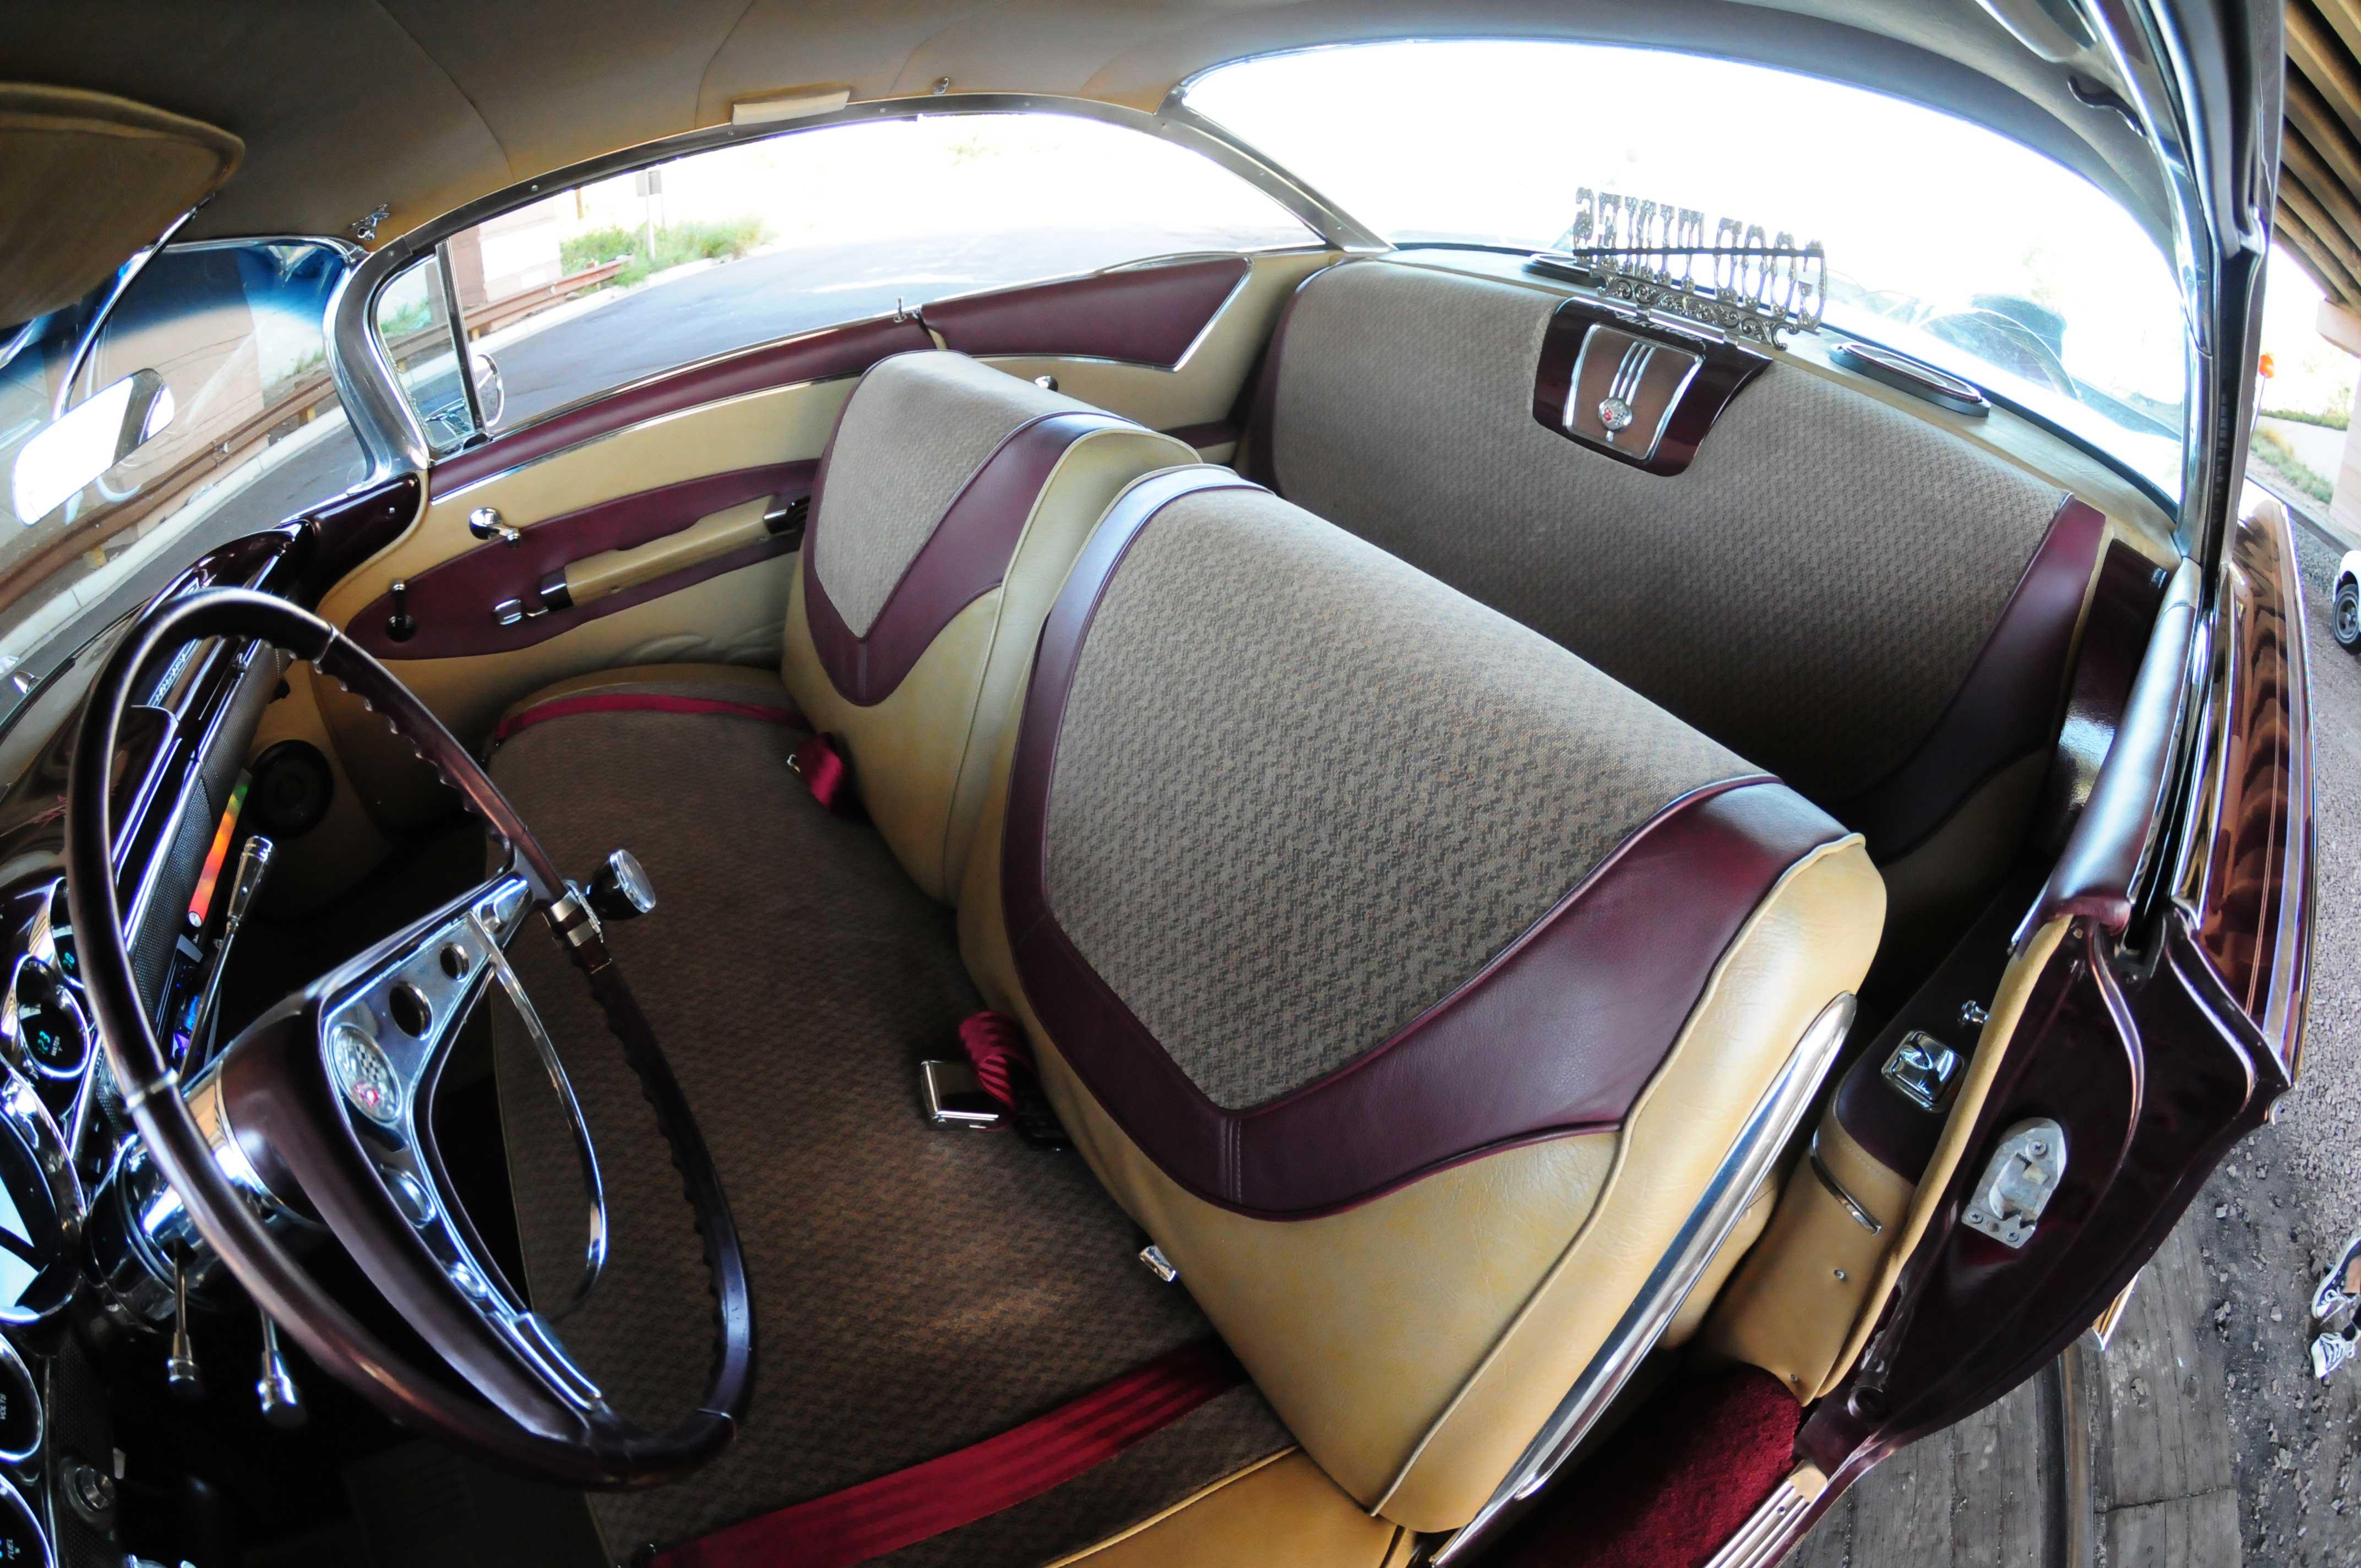 1960 Chevrolet Impala Hardtop - Talk is Cheap - Lowrider